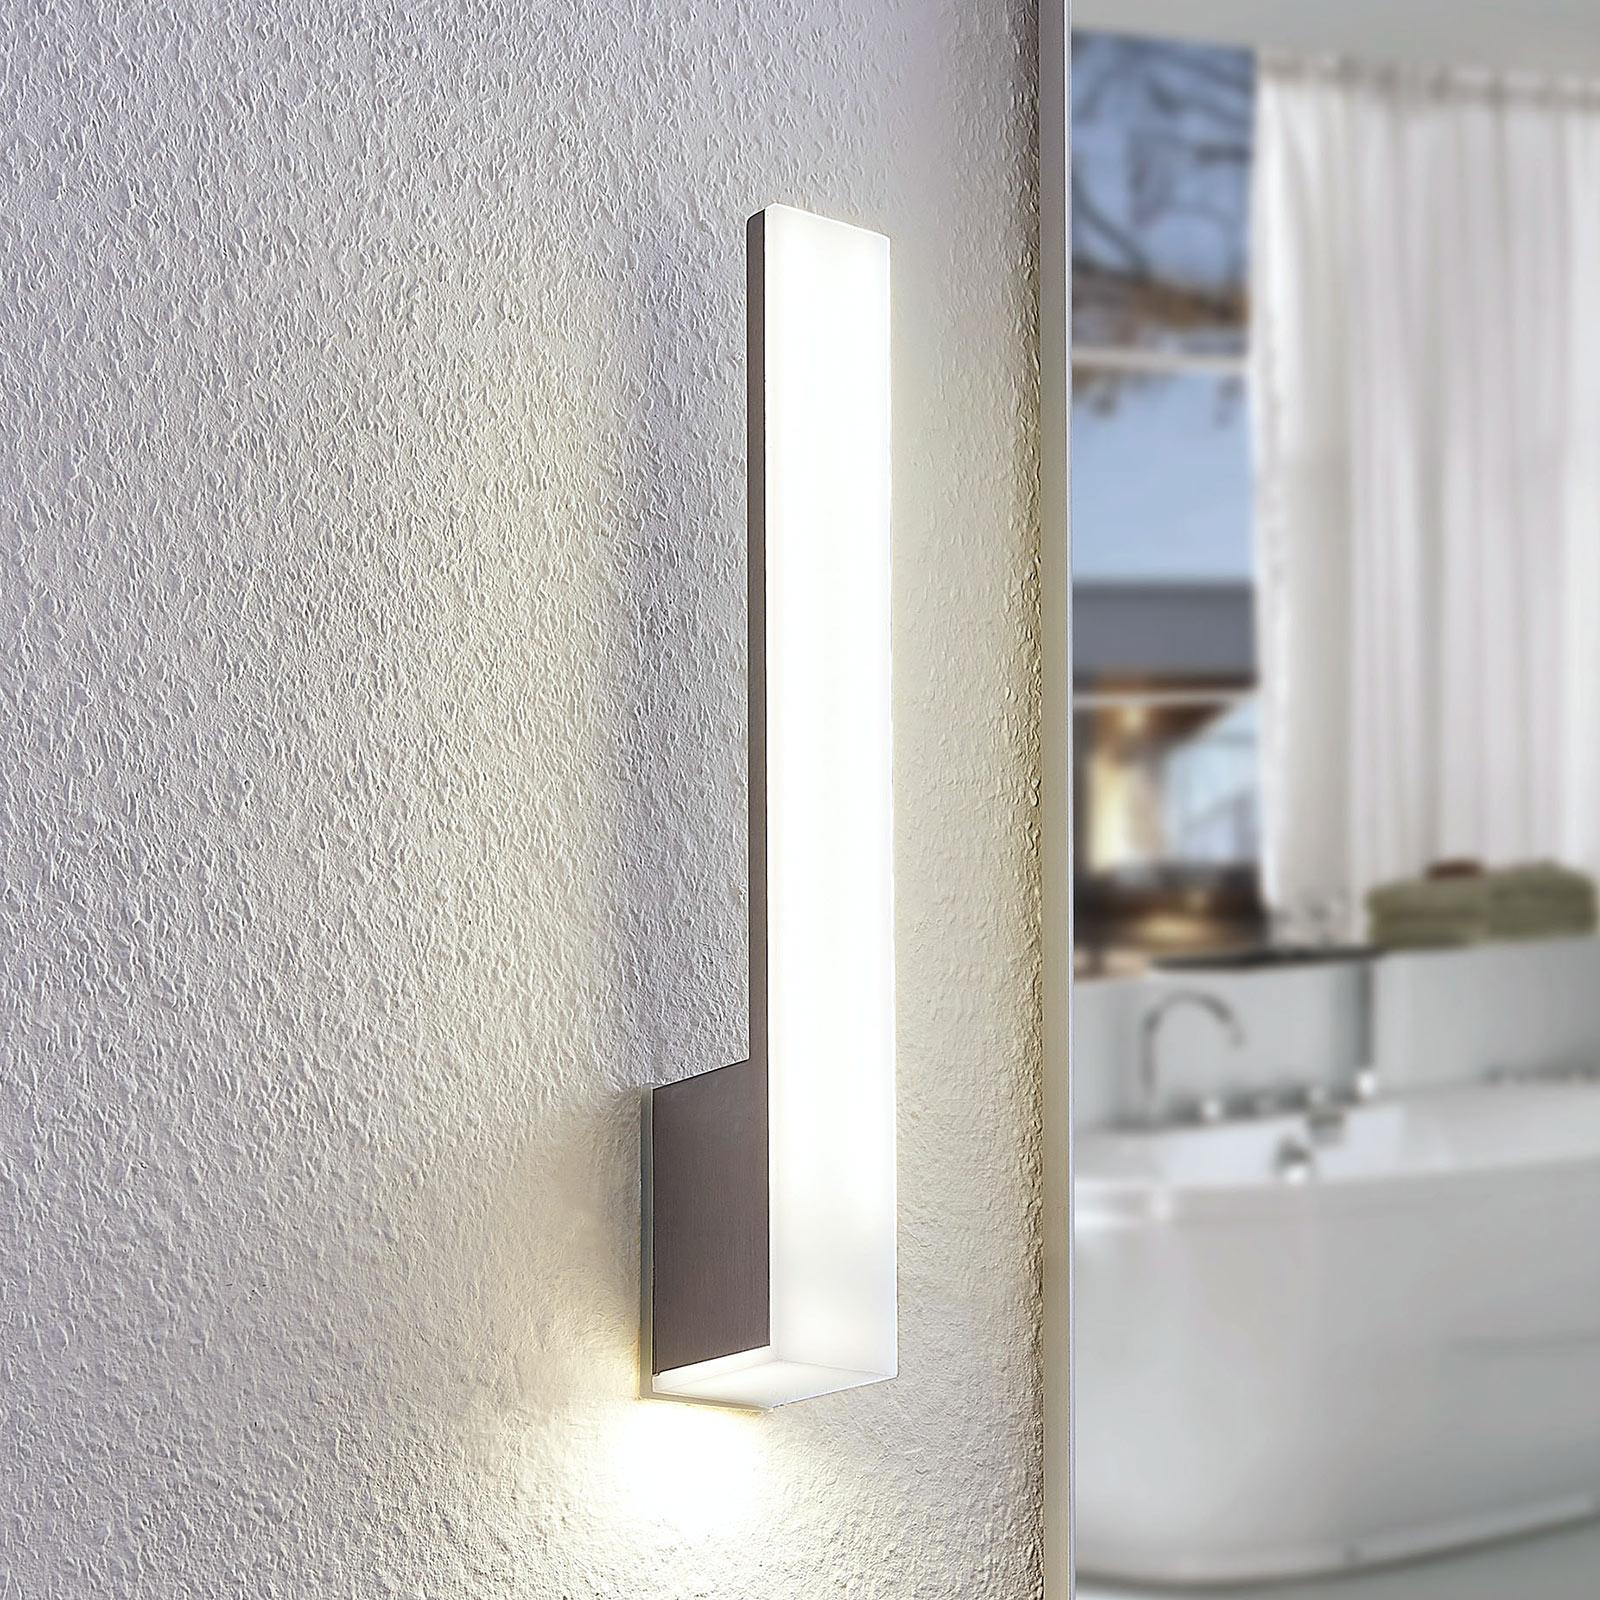 Lámpara de pared LED Eline, IP42, 40 cm